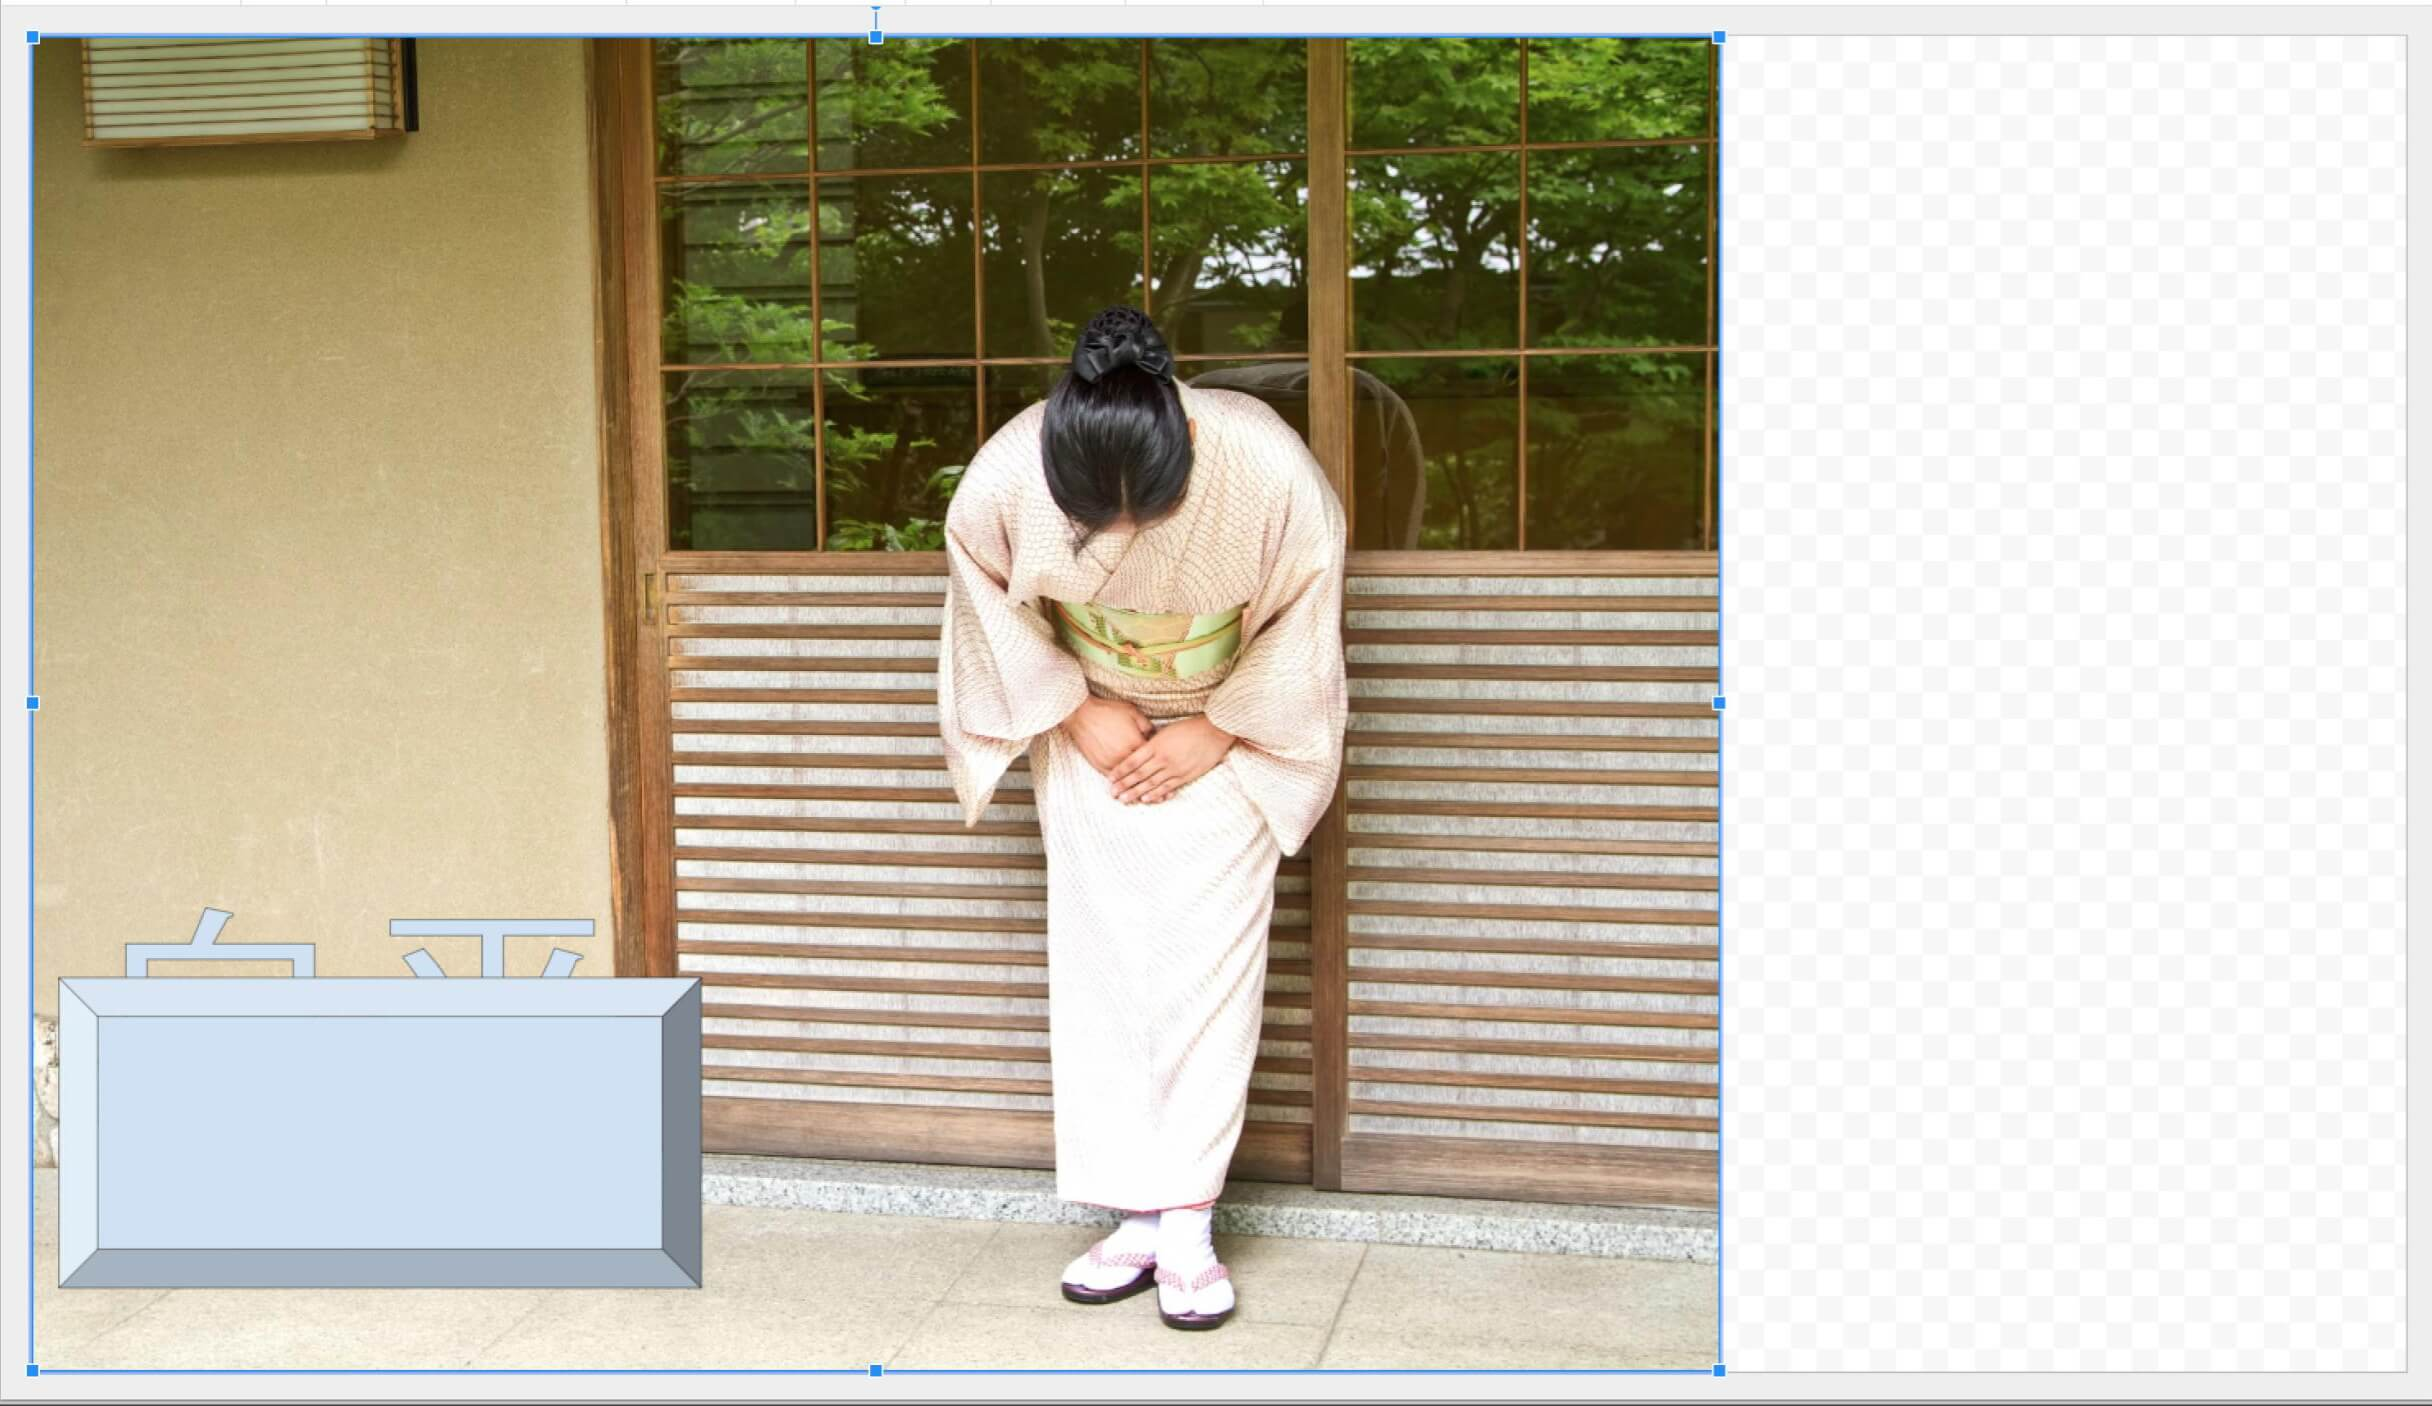 Google図形描画 玄関先で出迎える女将とベベルの背後にある白平